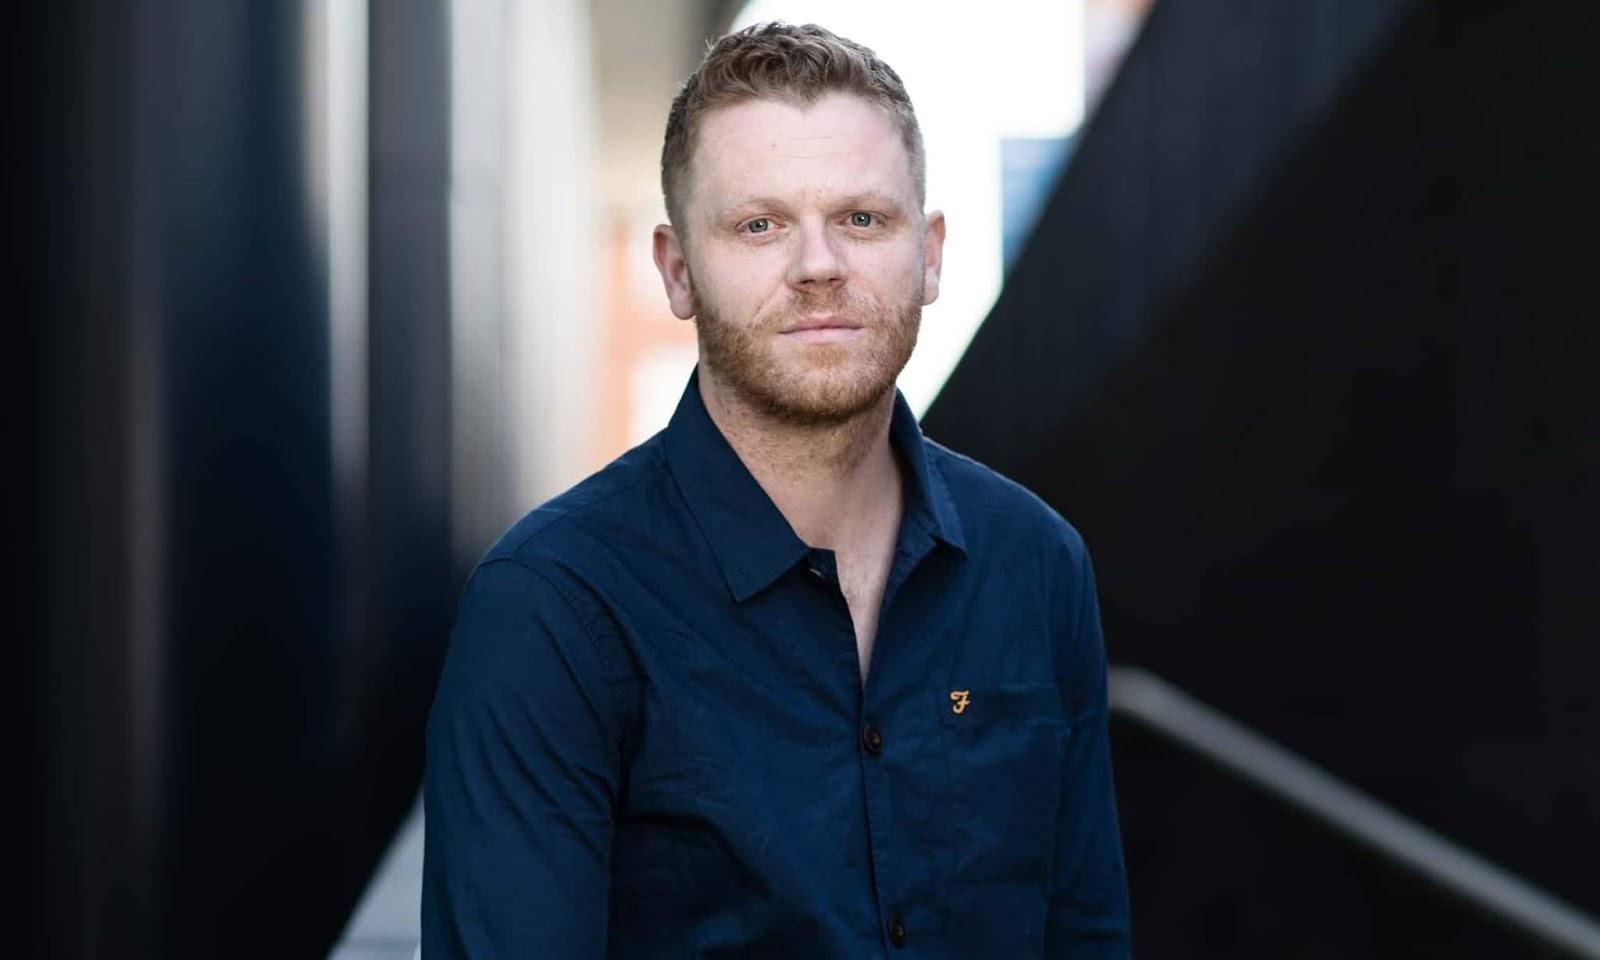 Darren McGarvey